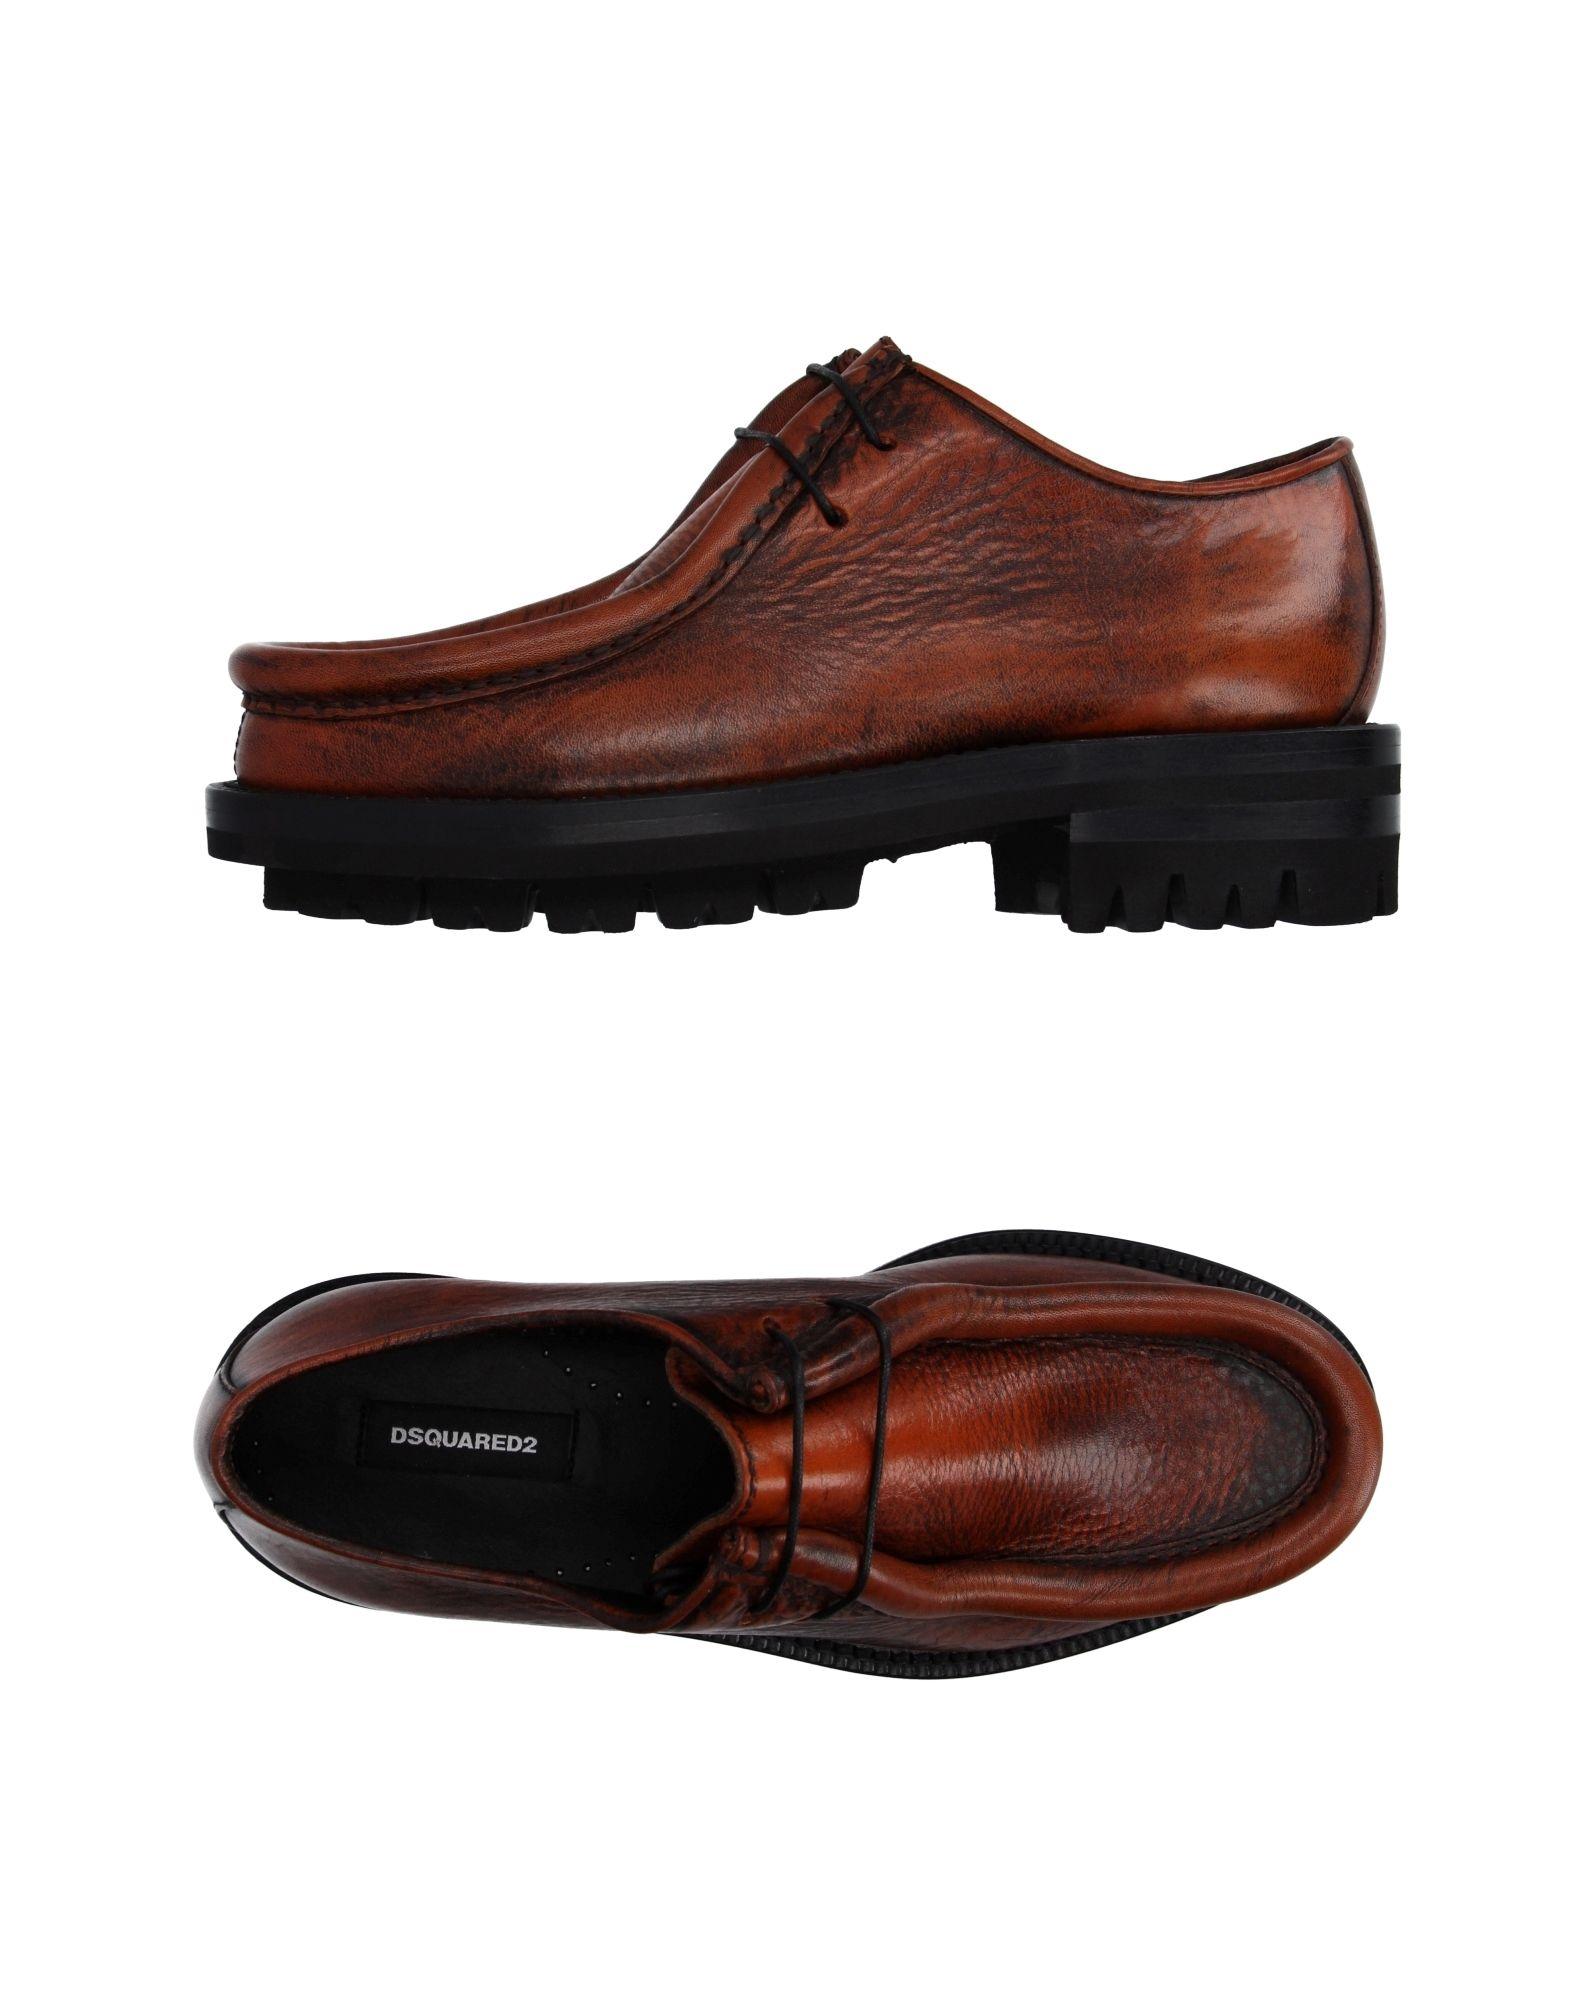 Dsquared2 Mokassins Herren Schuhe  11082149KL Heiße Schuhe Herren fb0abb